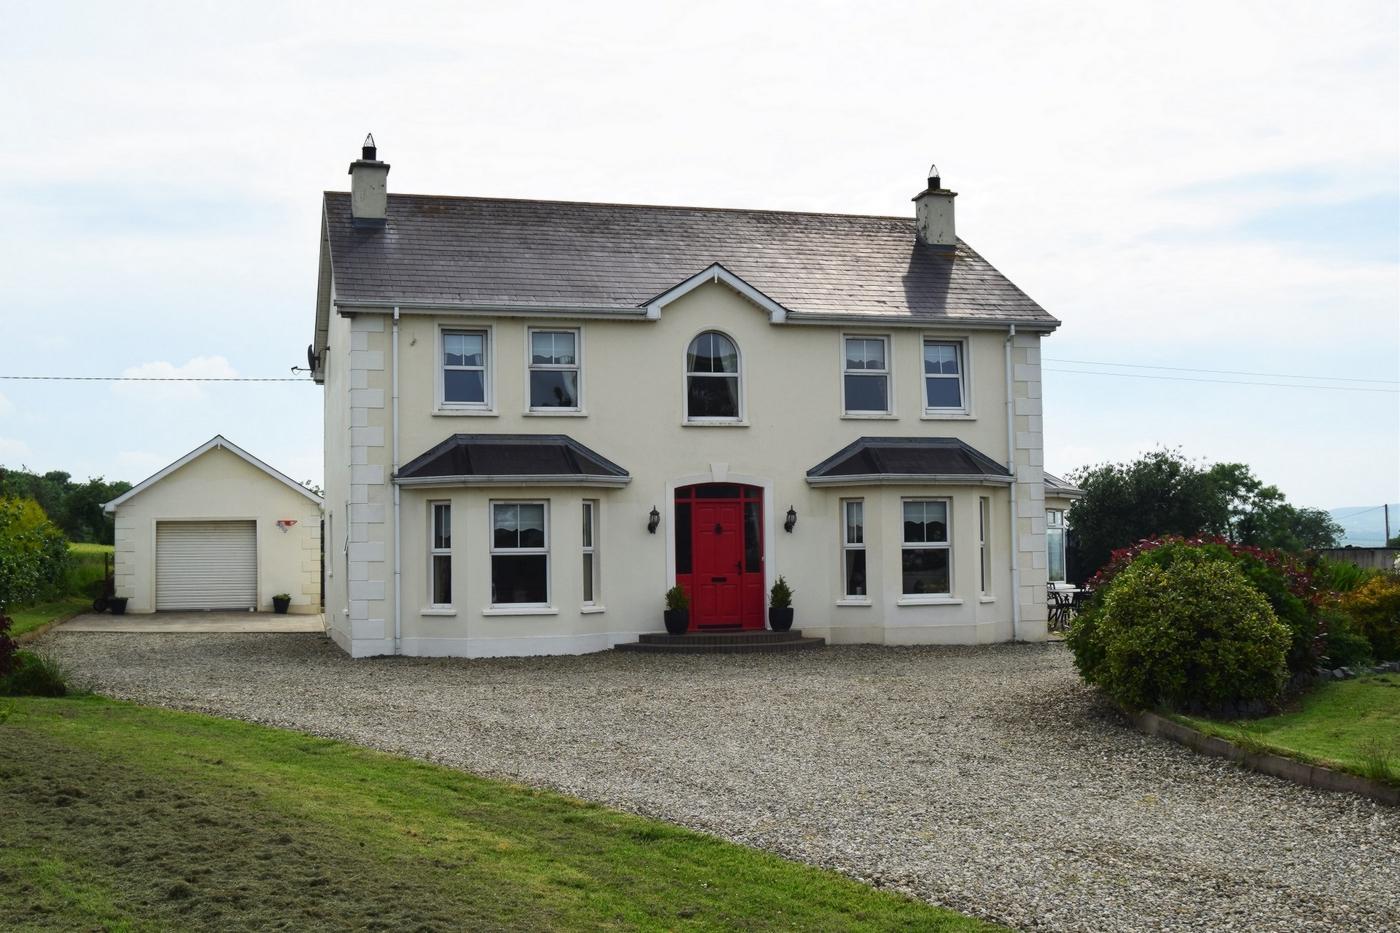 Dunmore, Carrigans  Donegal  Ireland